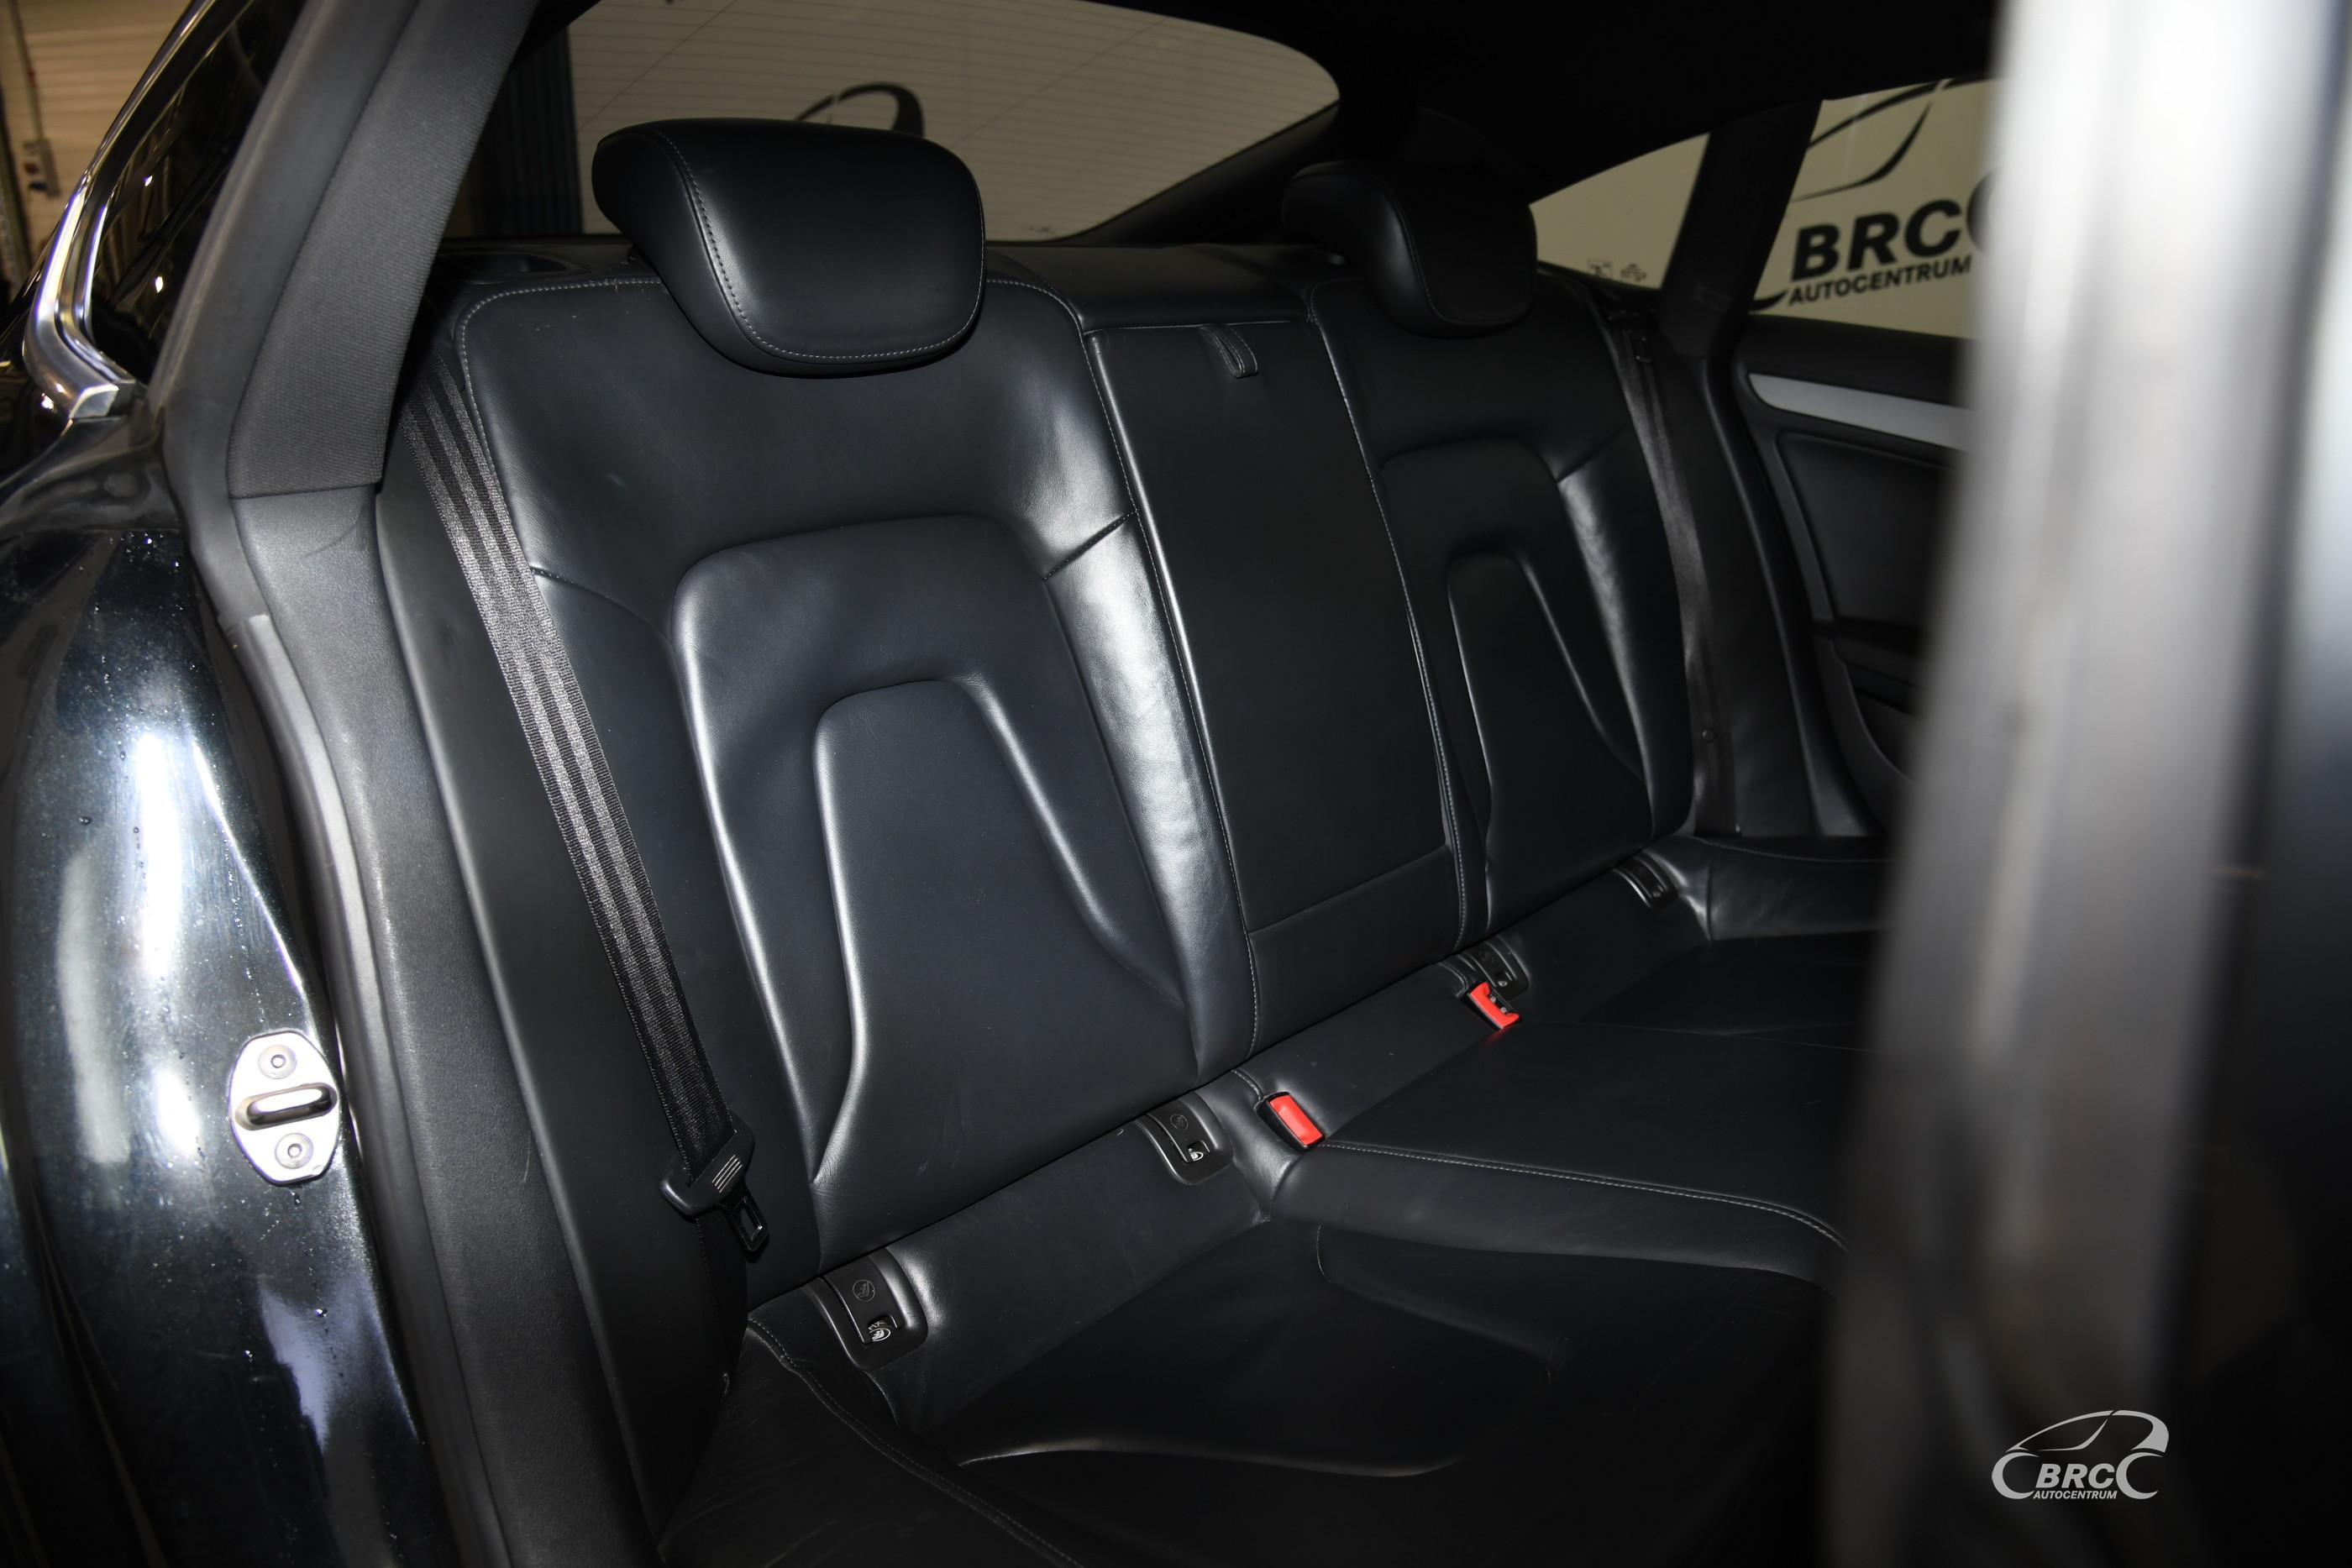 Audi A5 Sportback 2.7 TDI S-line Automatas